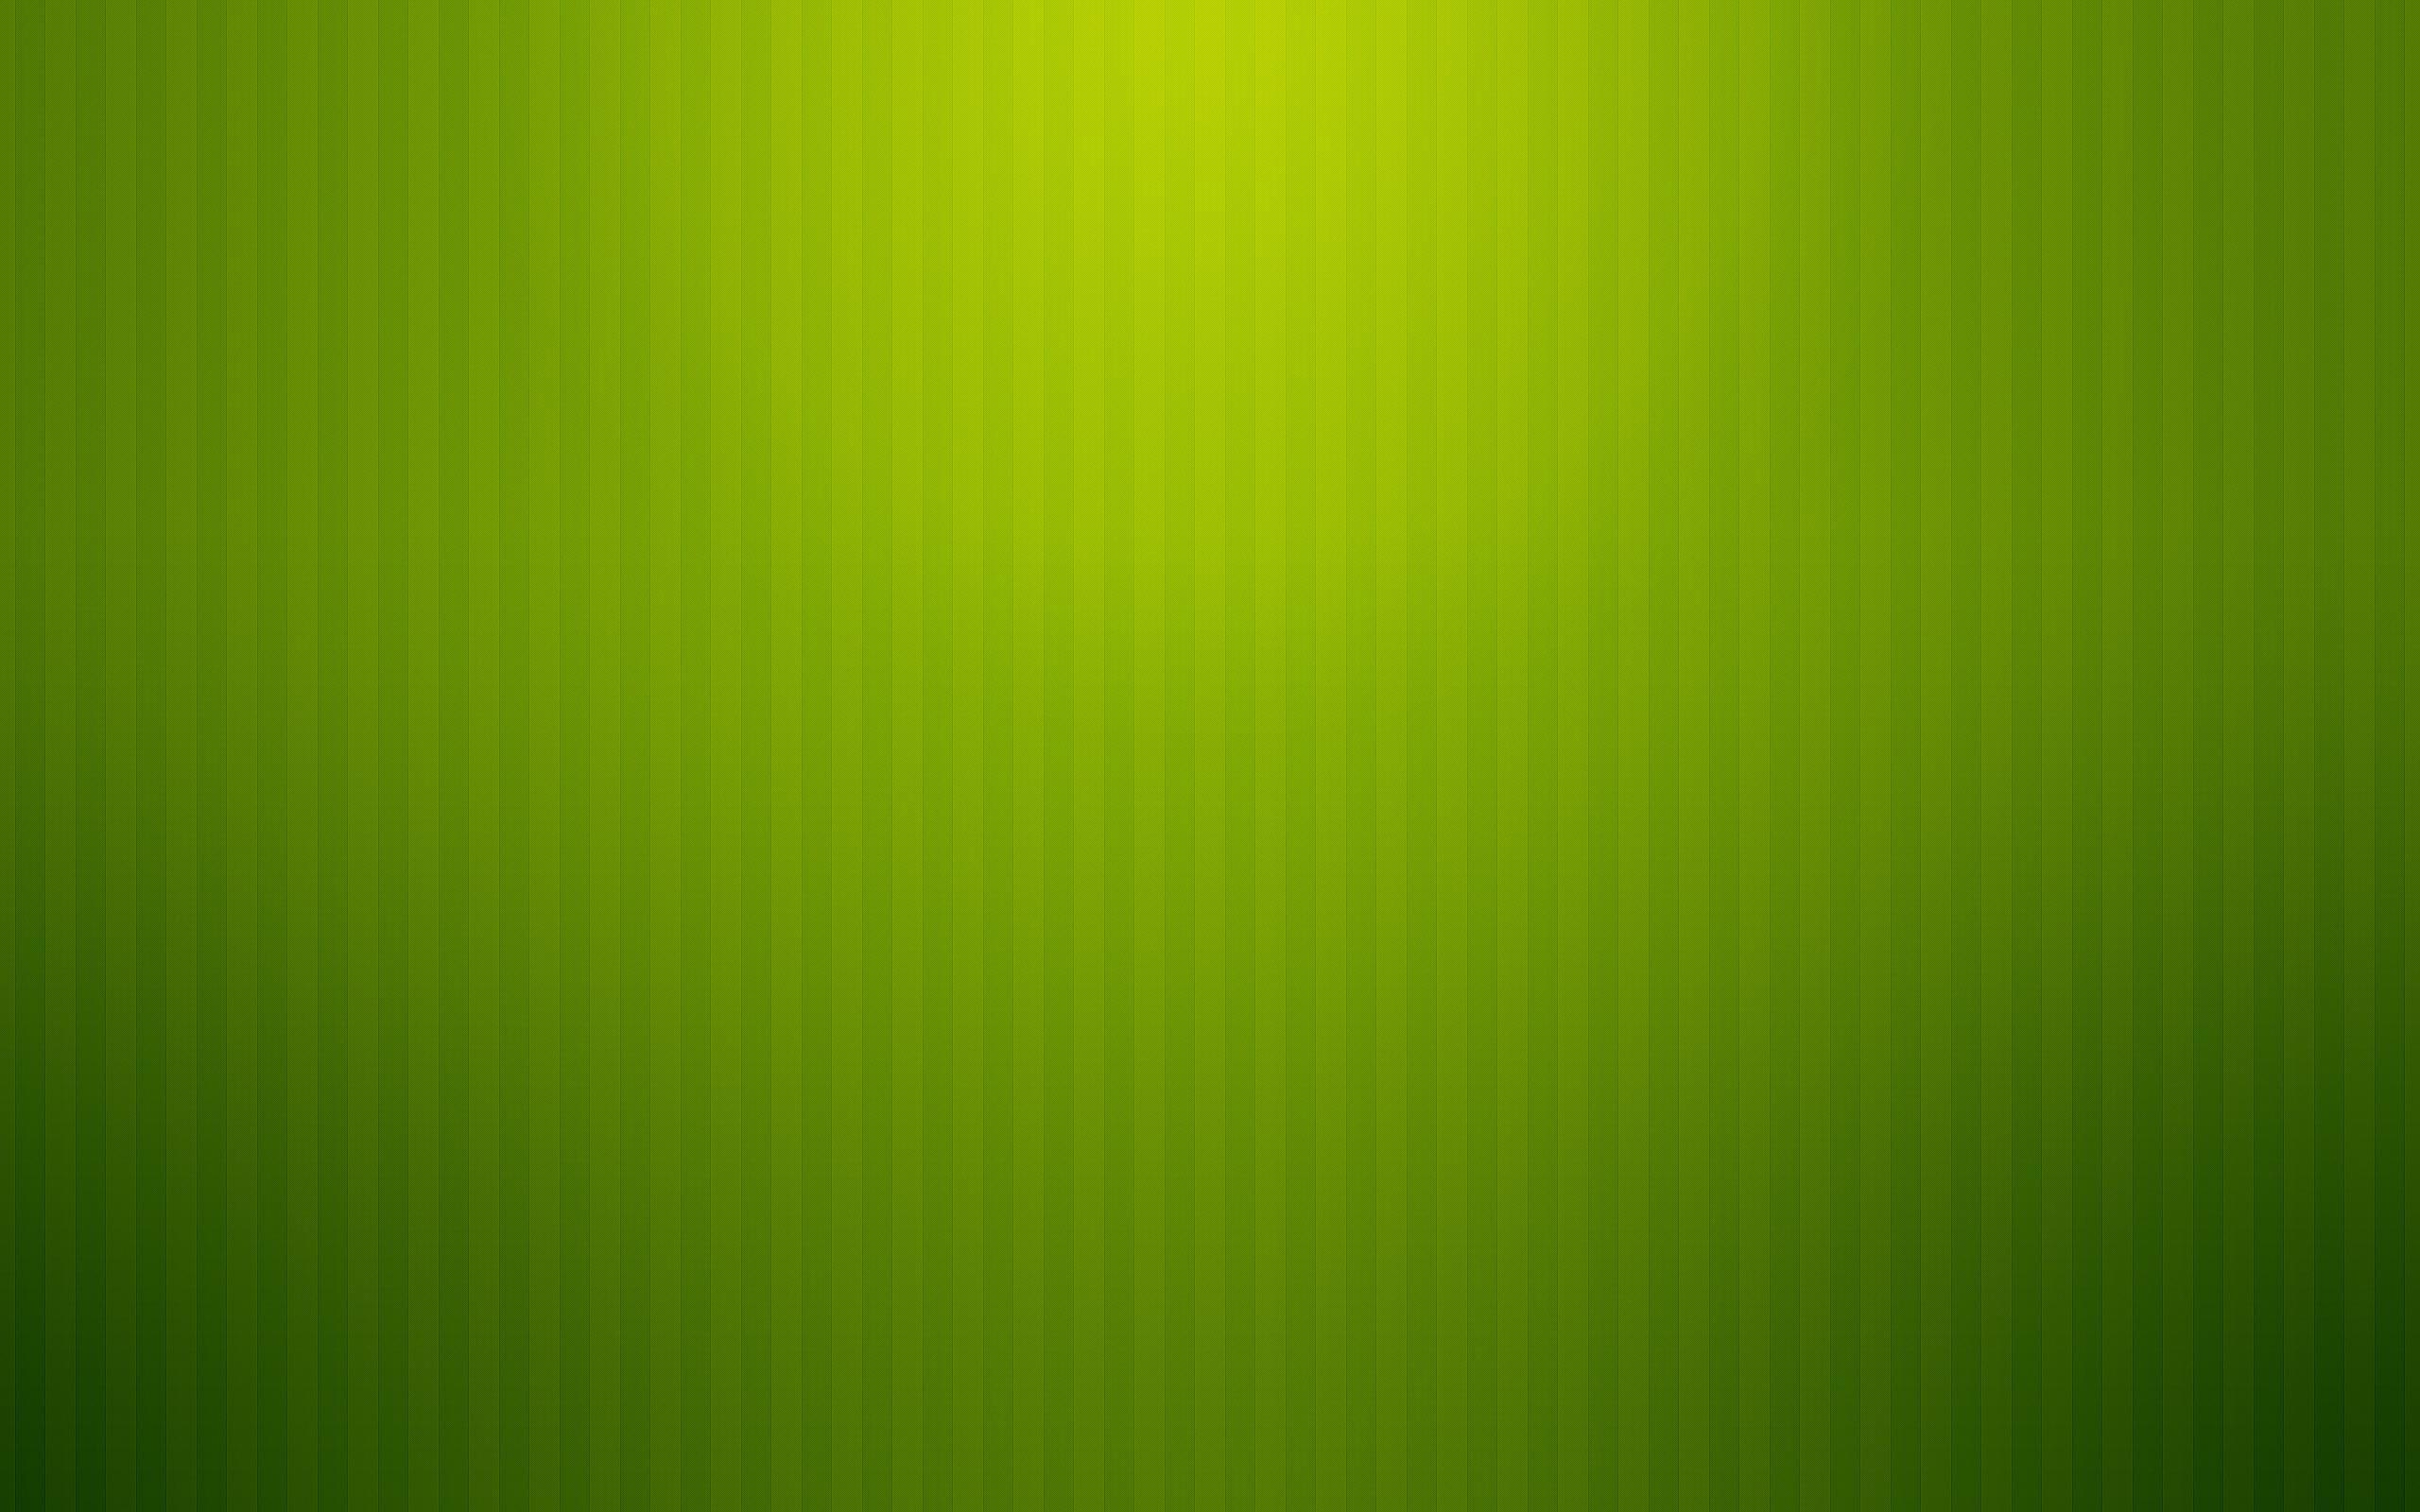 Green Desktop Backgrounds (73+ pictures)